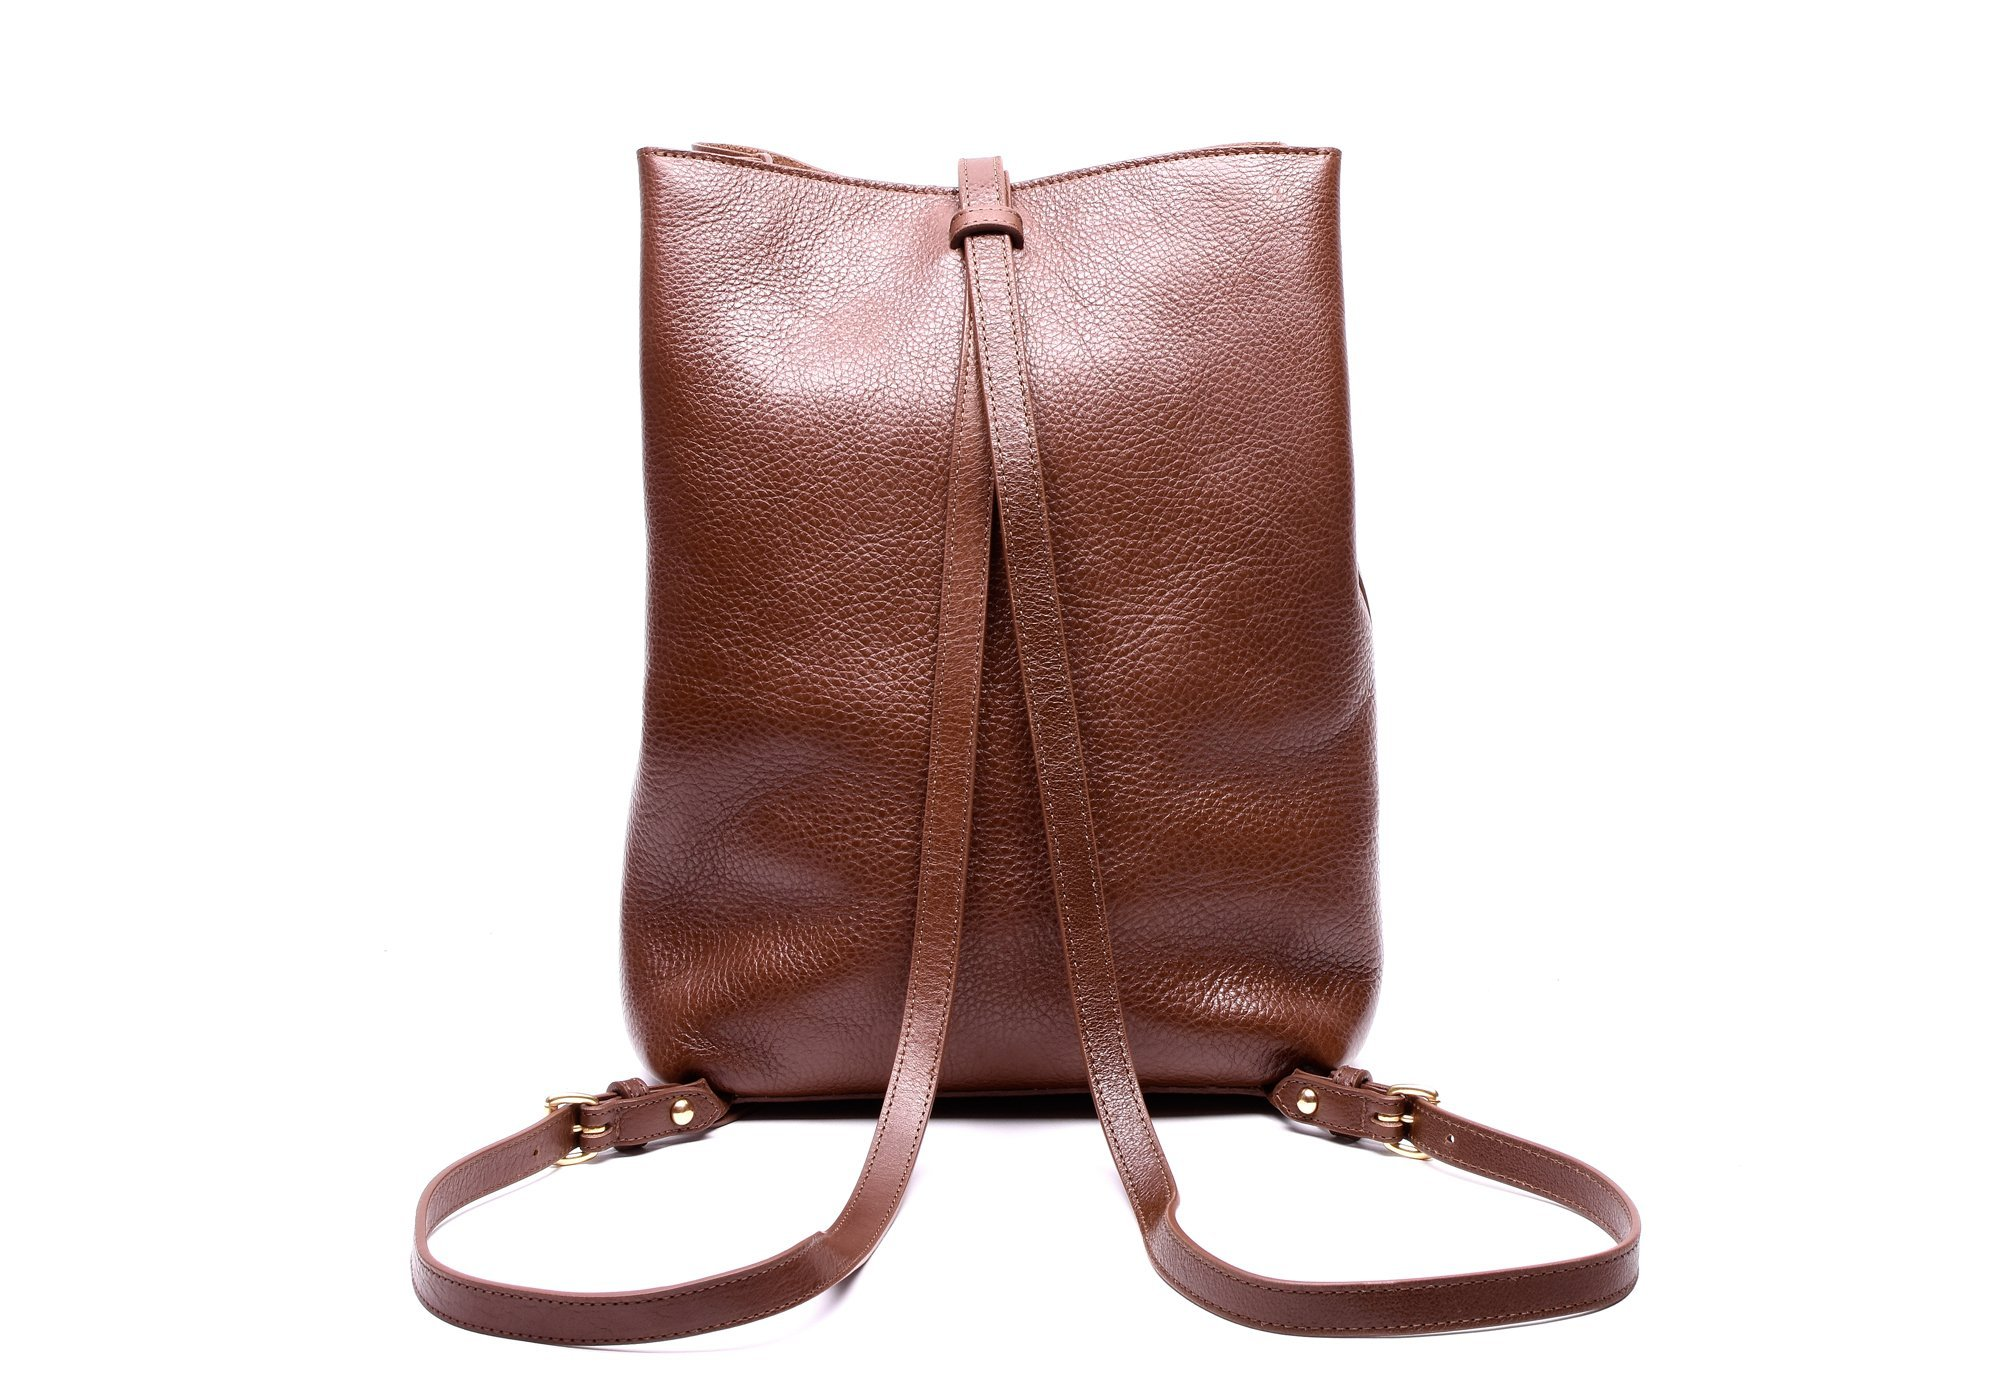 Lotuff-Leather-Sling-Backpack_-Chestnut-2_2000x.progressive